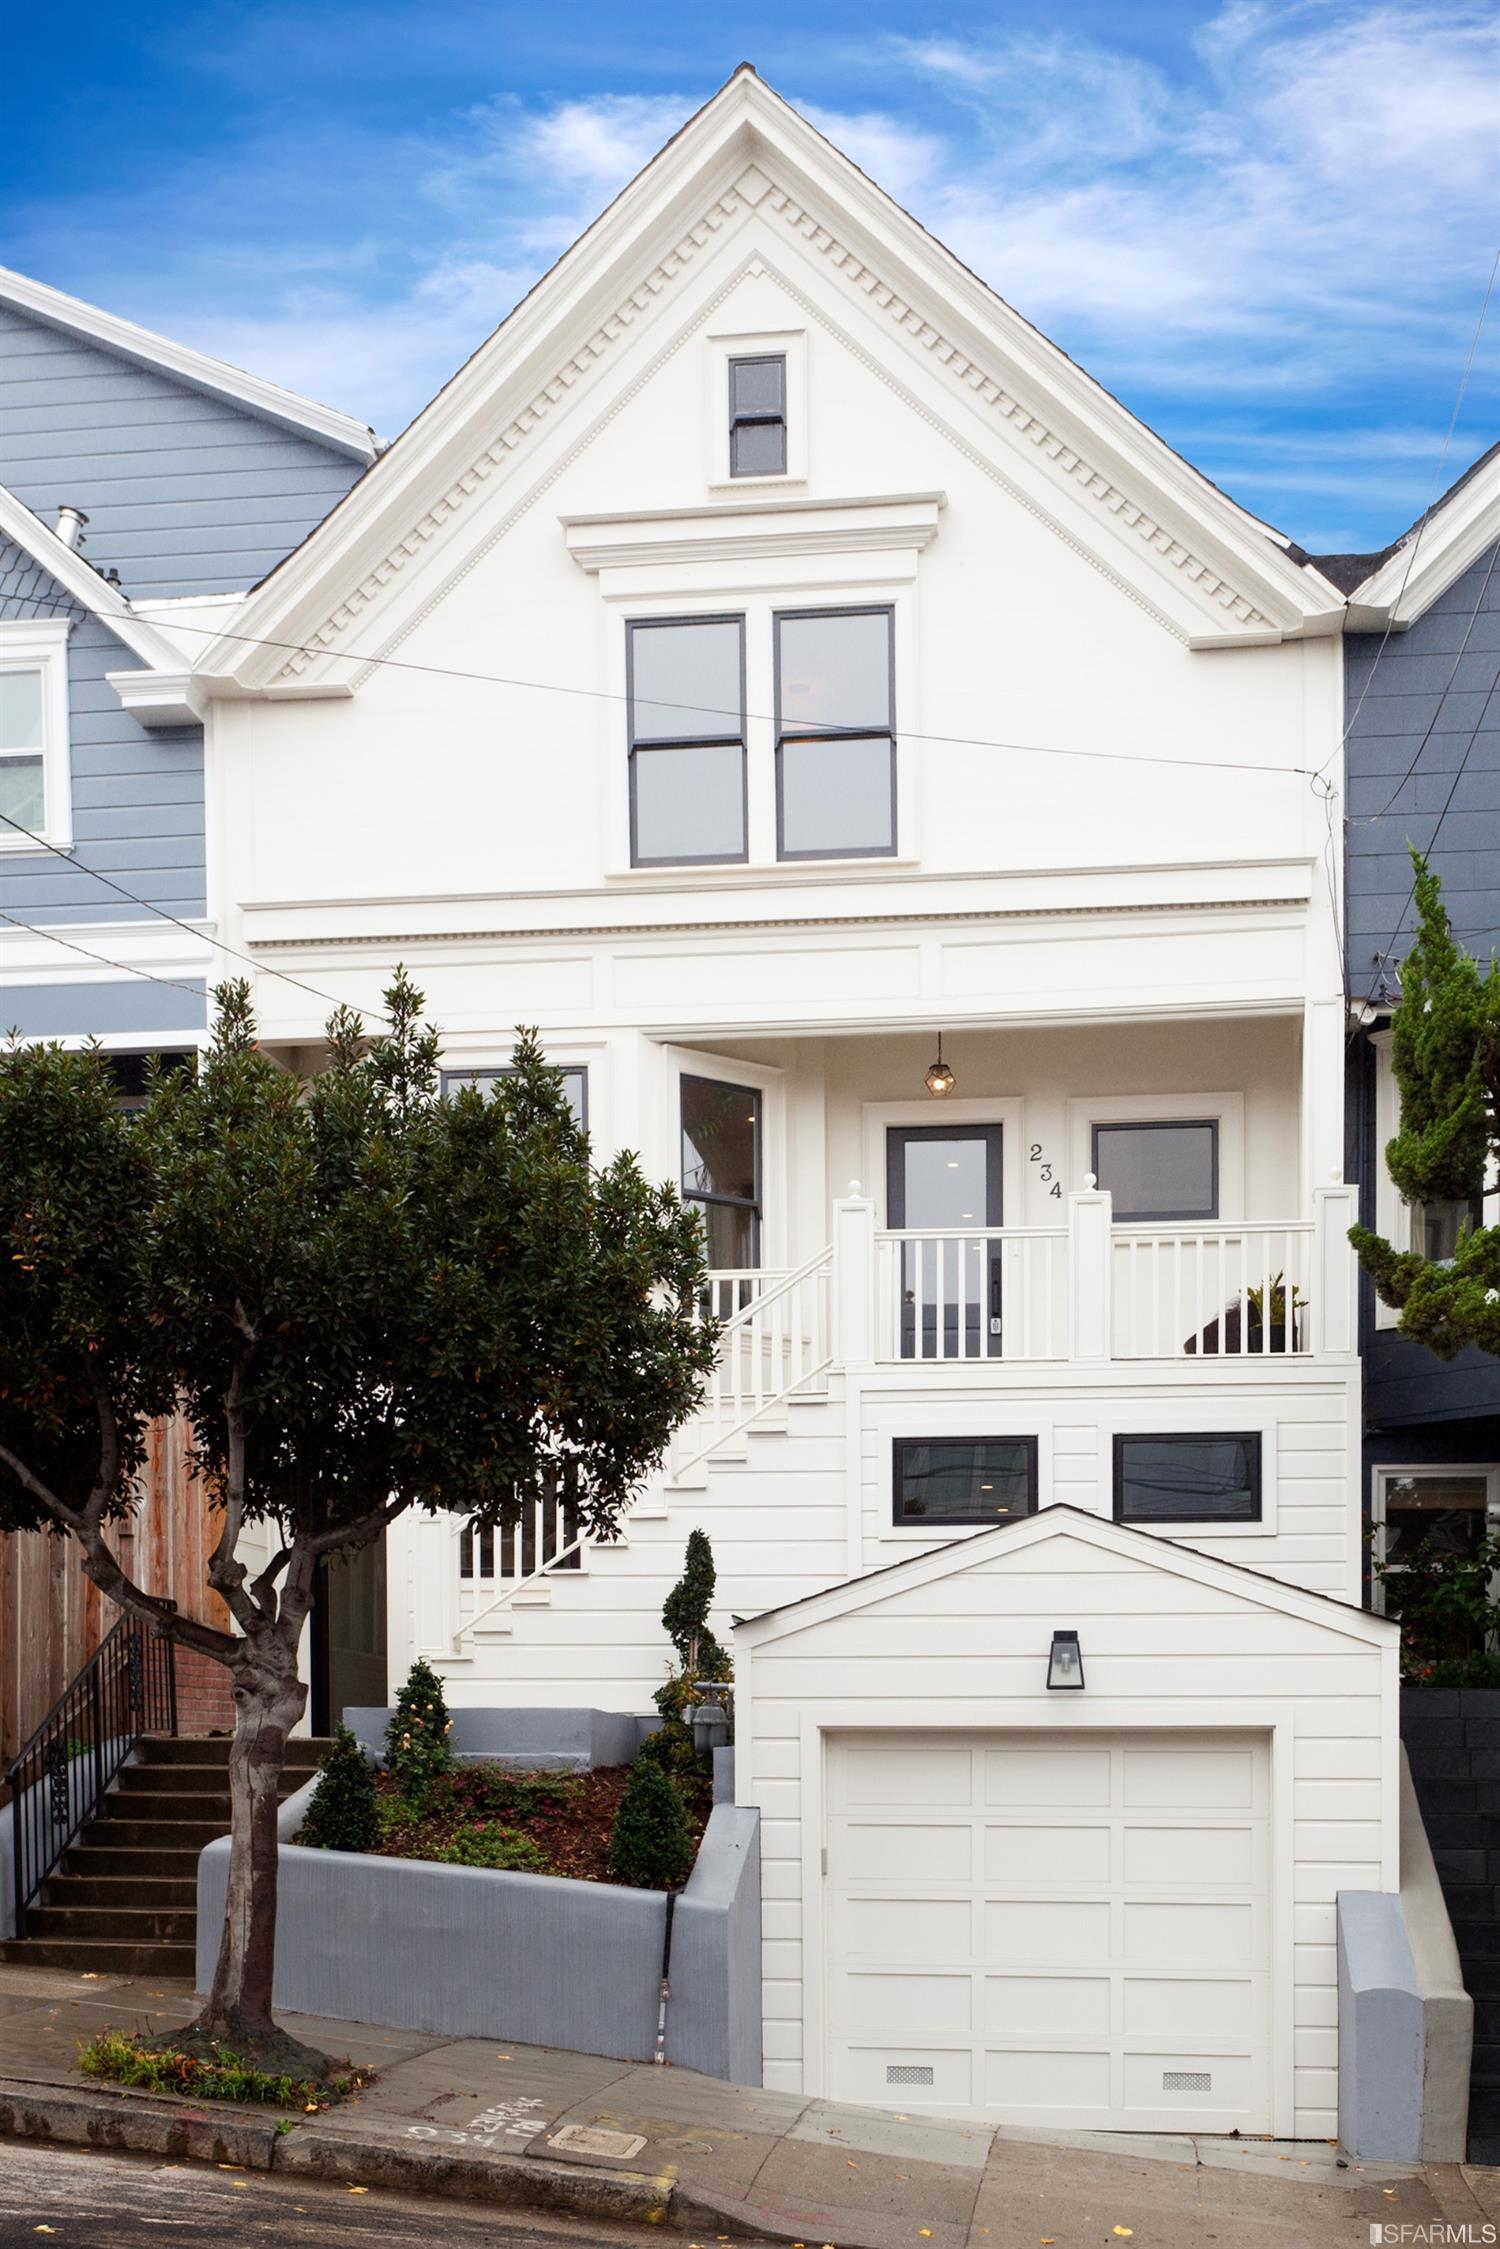 234-Eureka-Street-San-Francisco-CA-94114.jpg